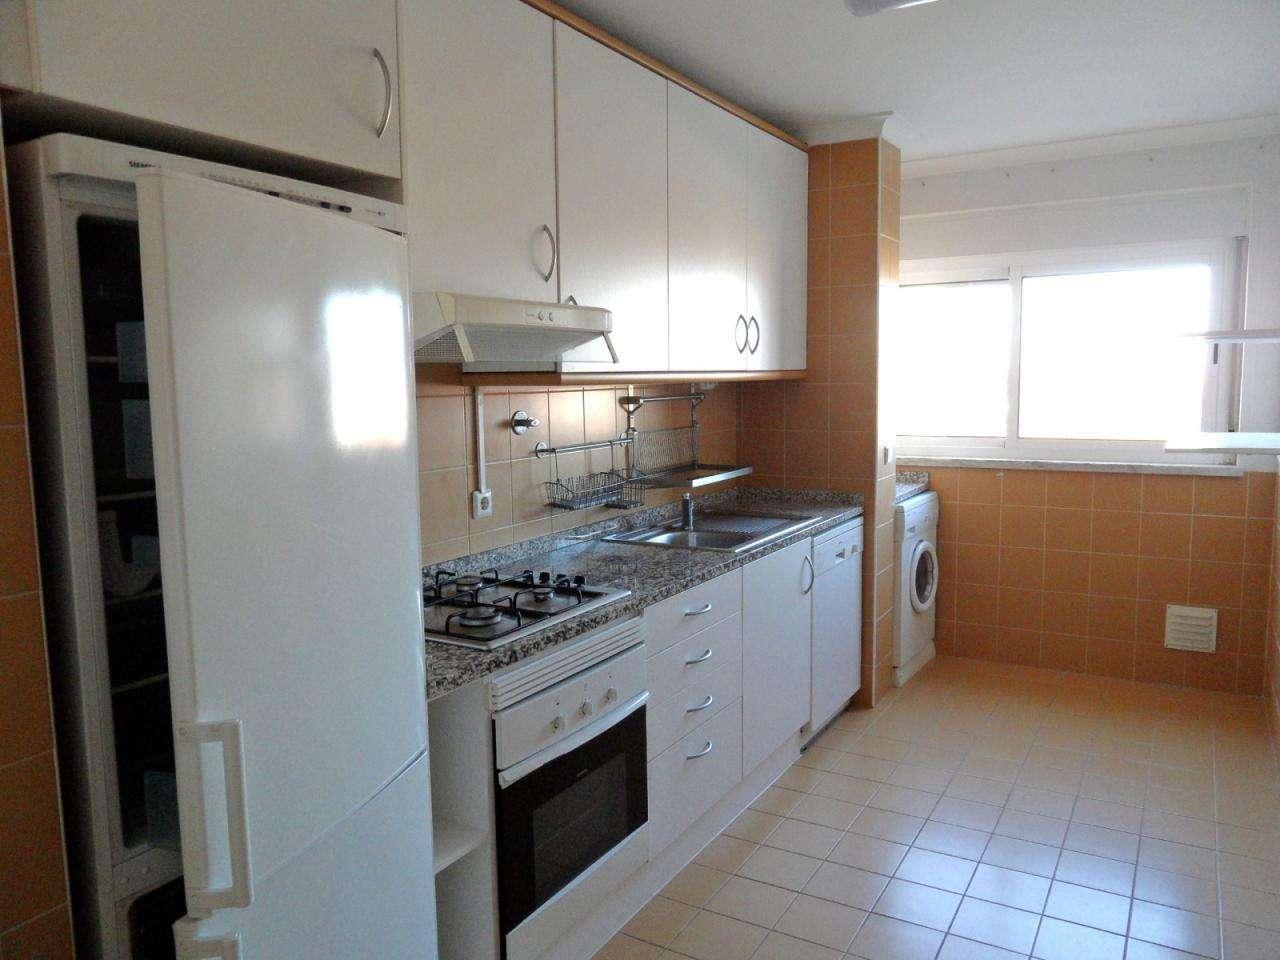 Apartamento para comprar, Areeiro, Lisboa - Foto 6